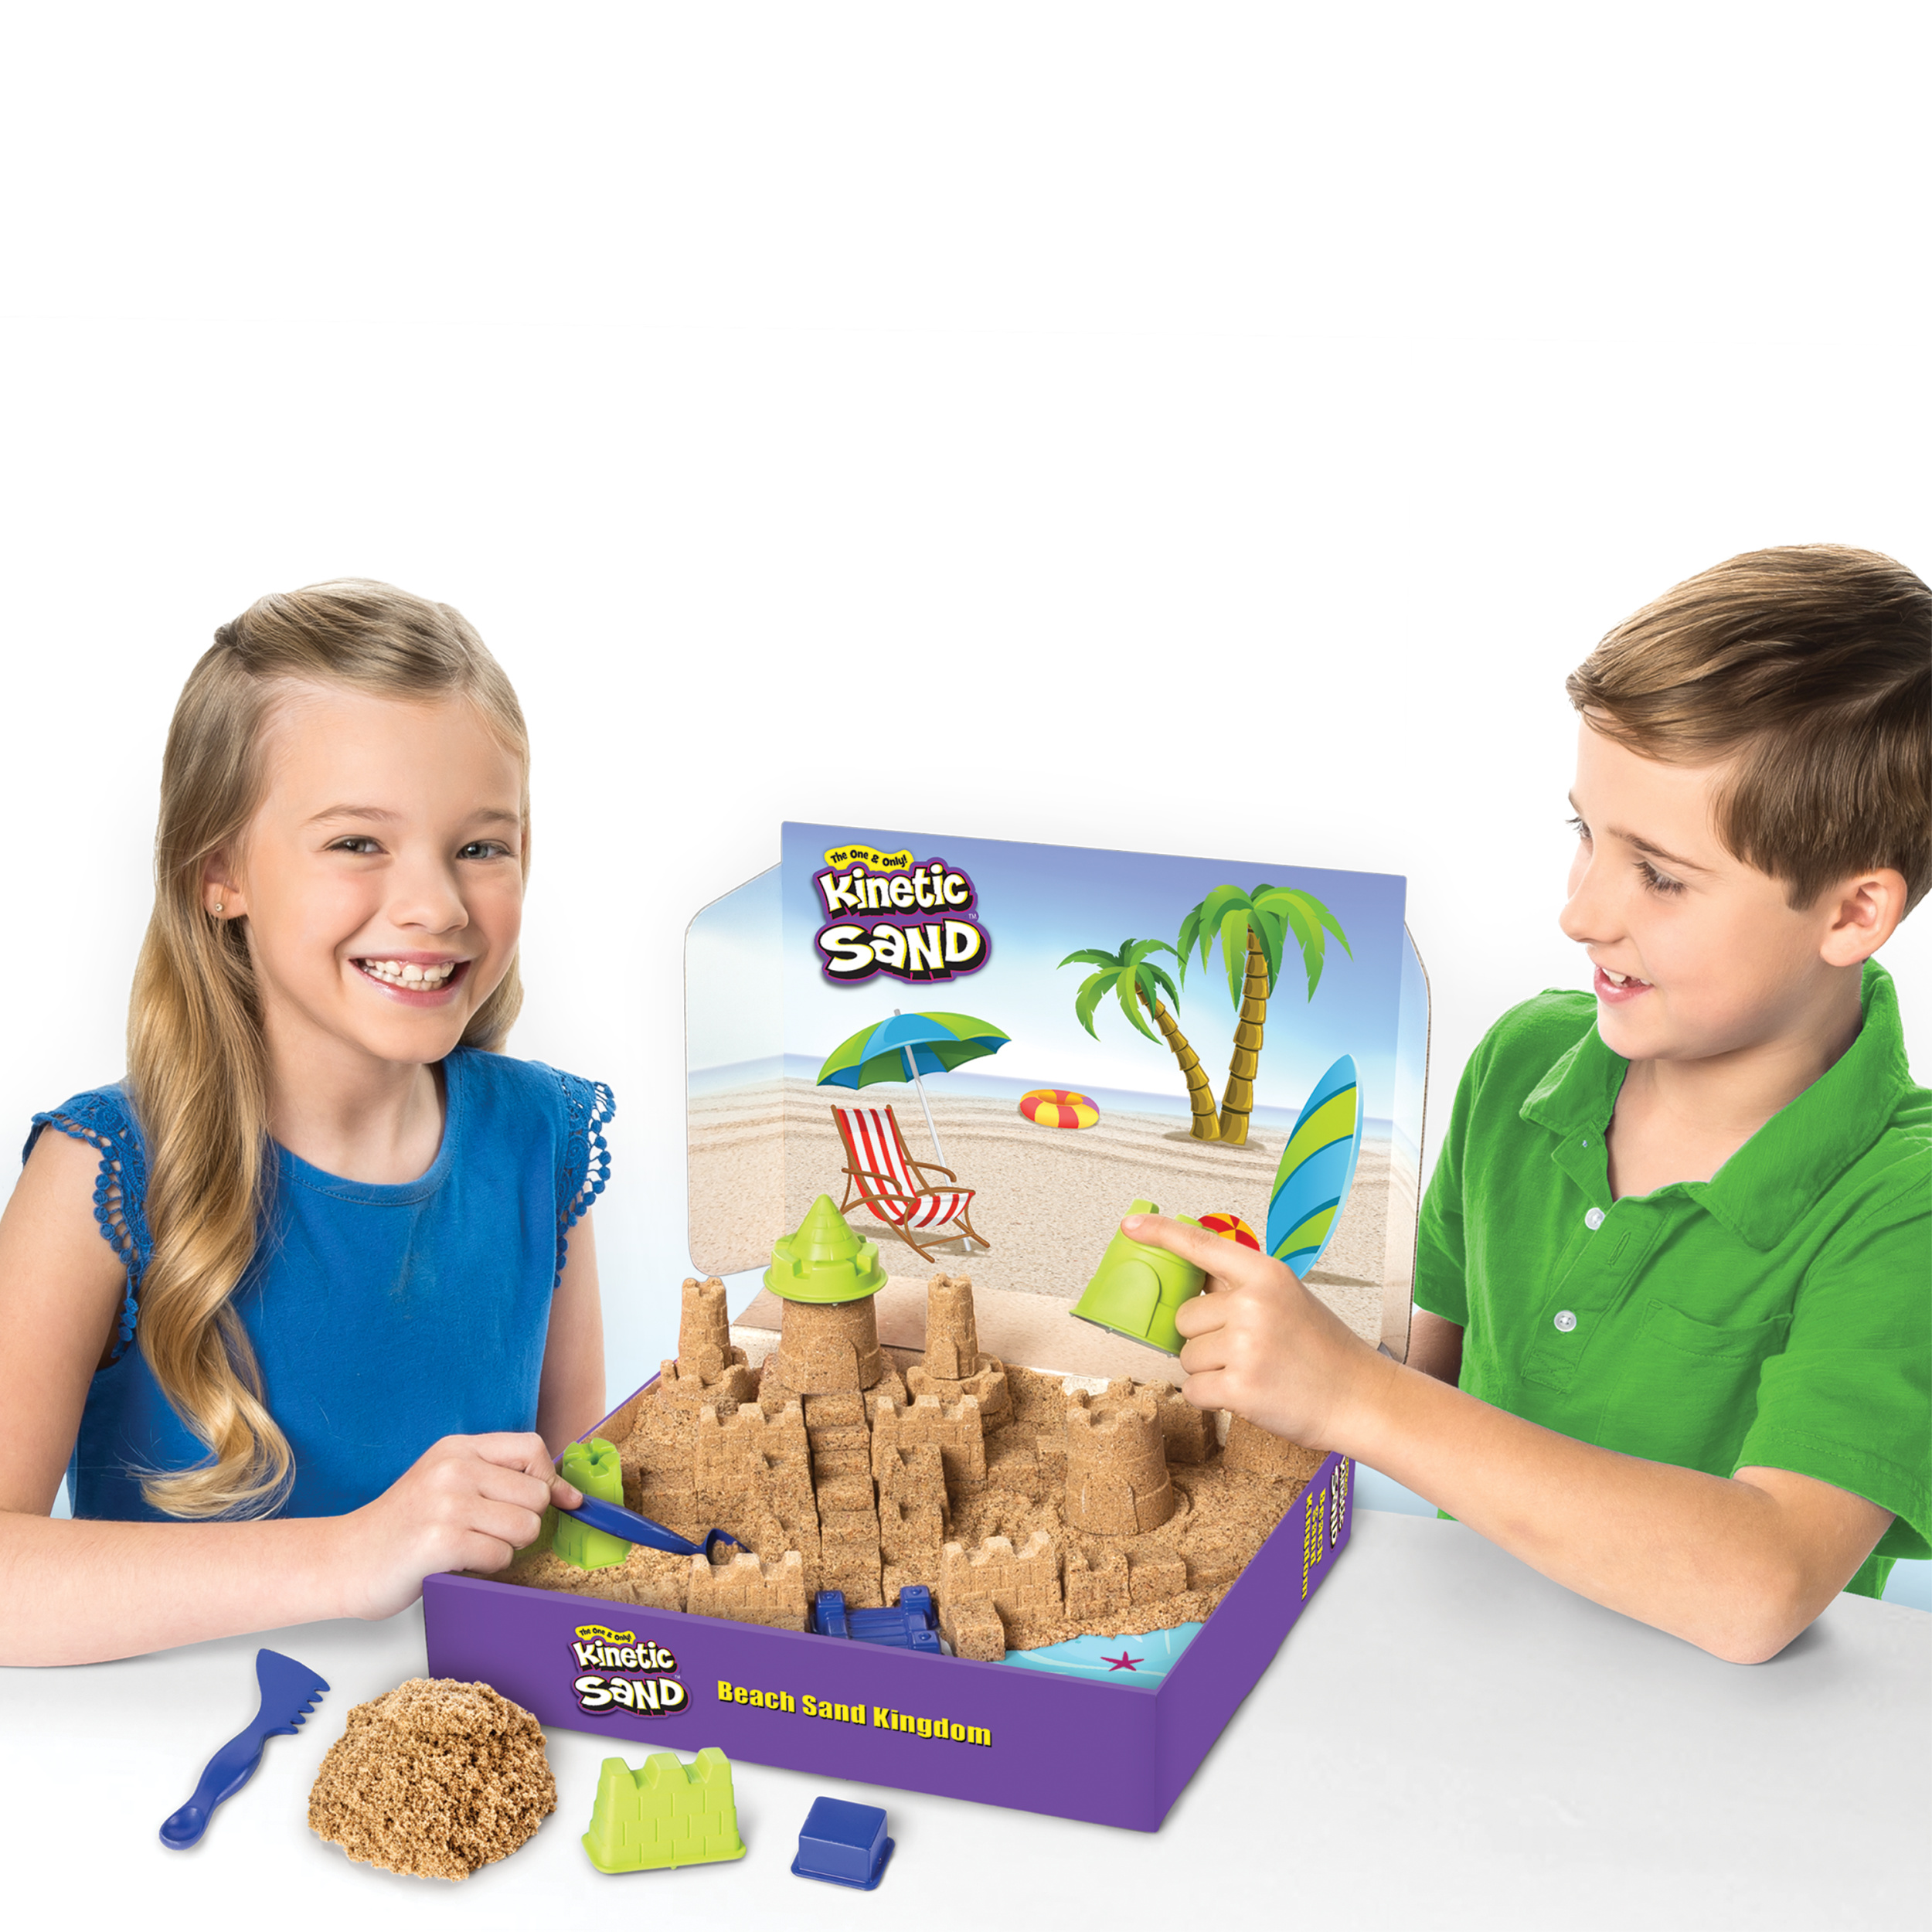 For Ages 3 An Beach Sand Kingdom Playset With 3Lbs Of Beach Sand Kinetic Sand